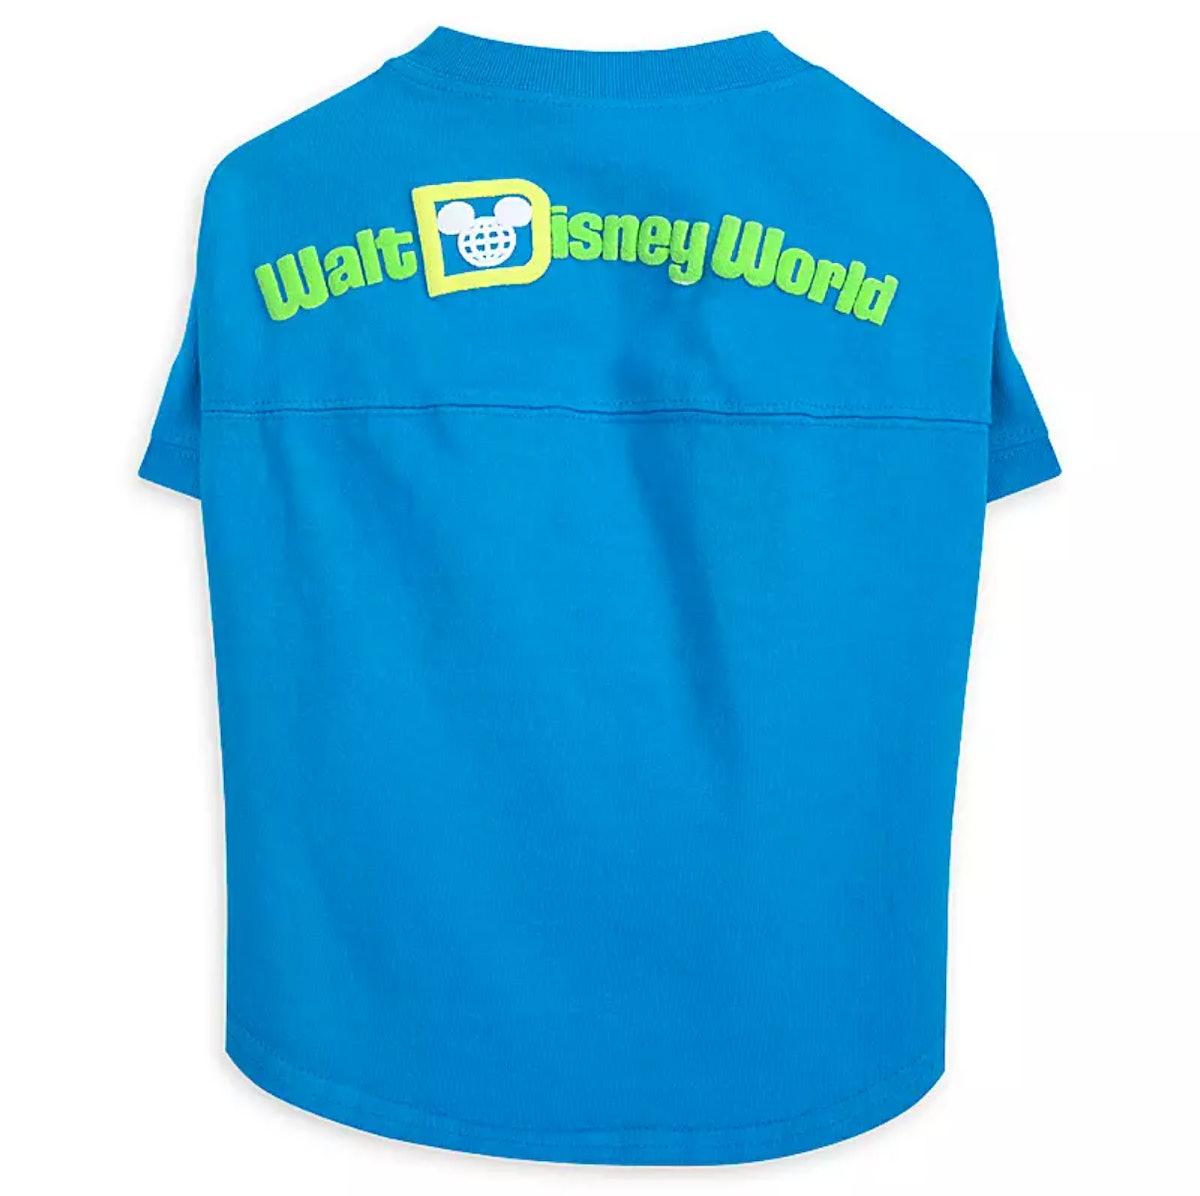 Walt Disney World Spirit Jersey for Dogs – Blue